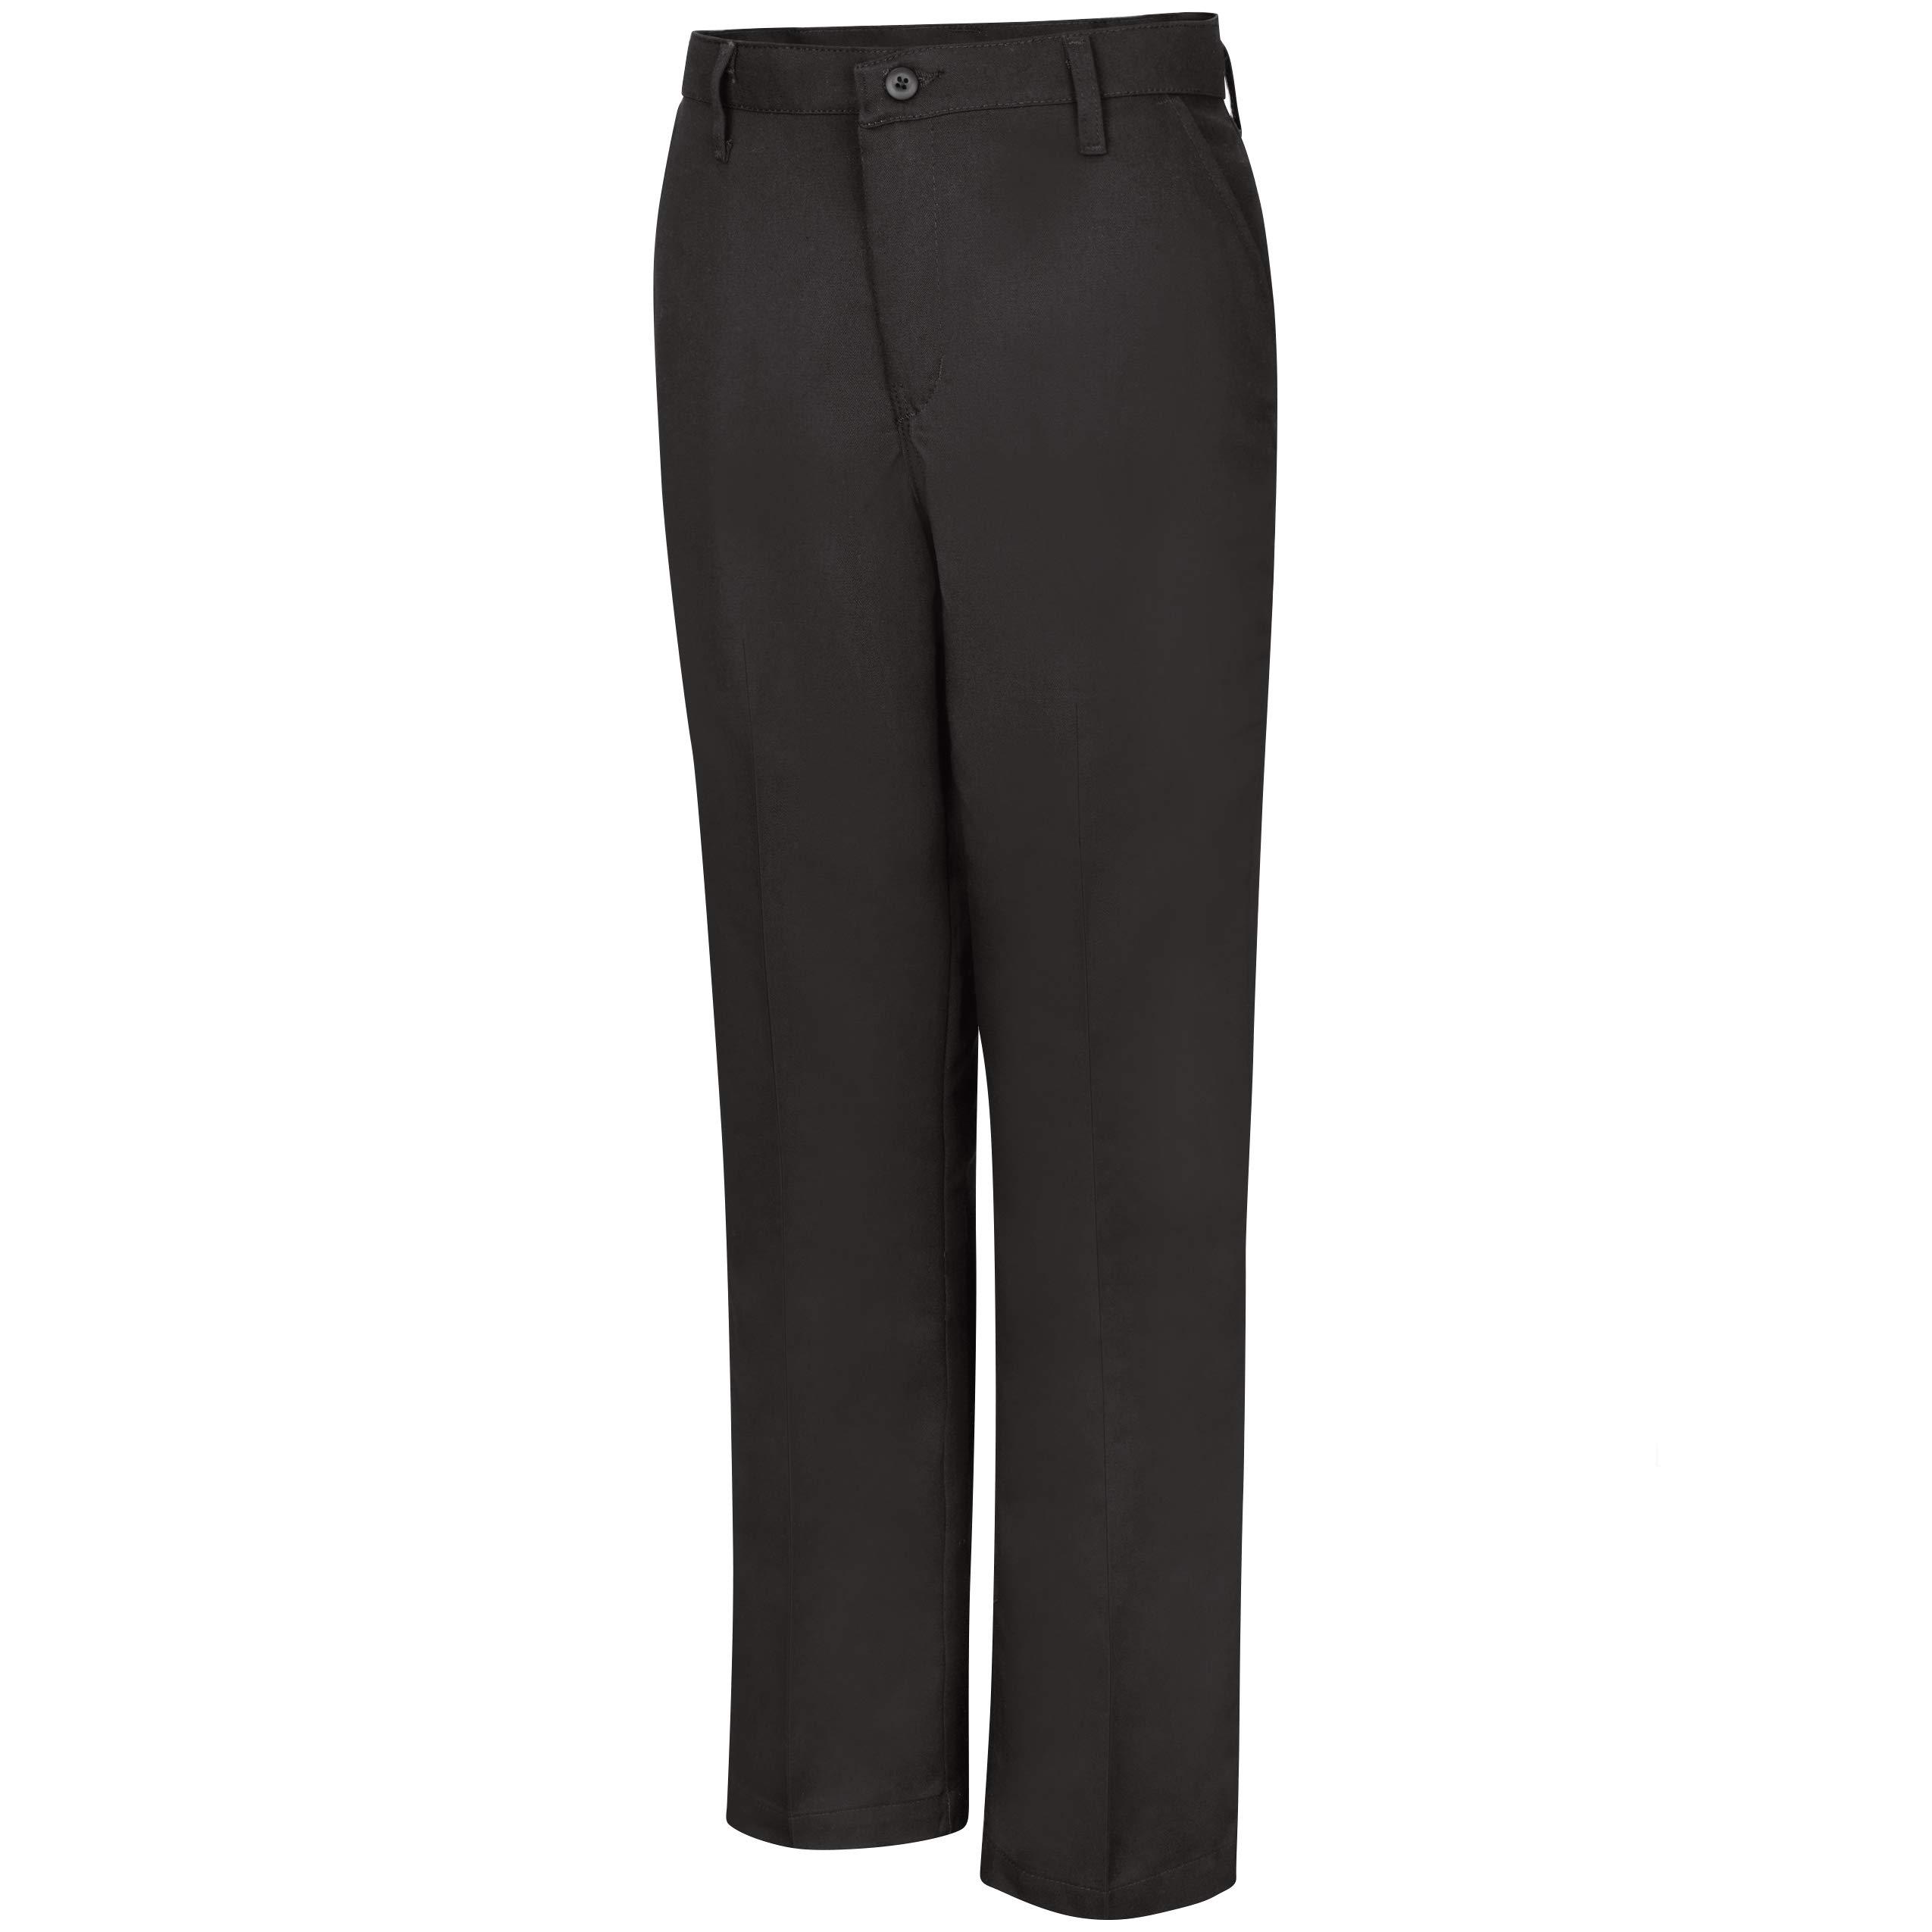 Red Kap Women's Utility Pant with Mimix